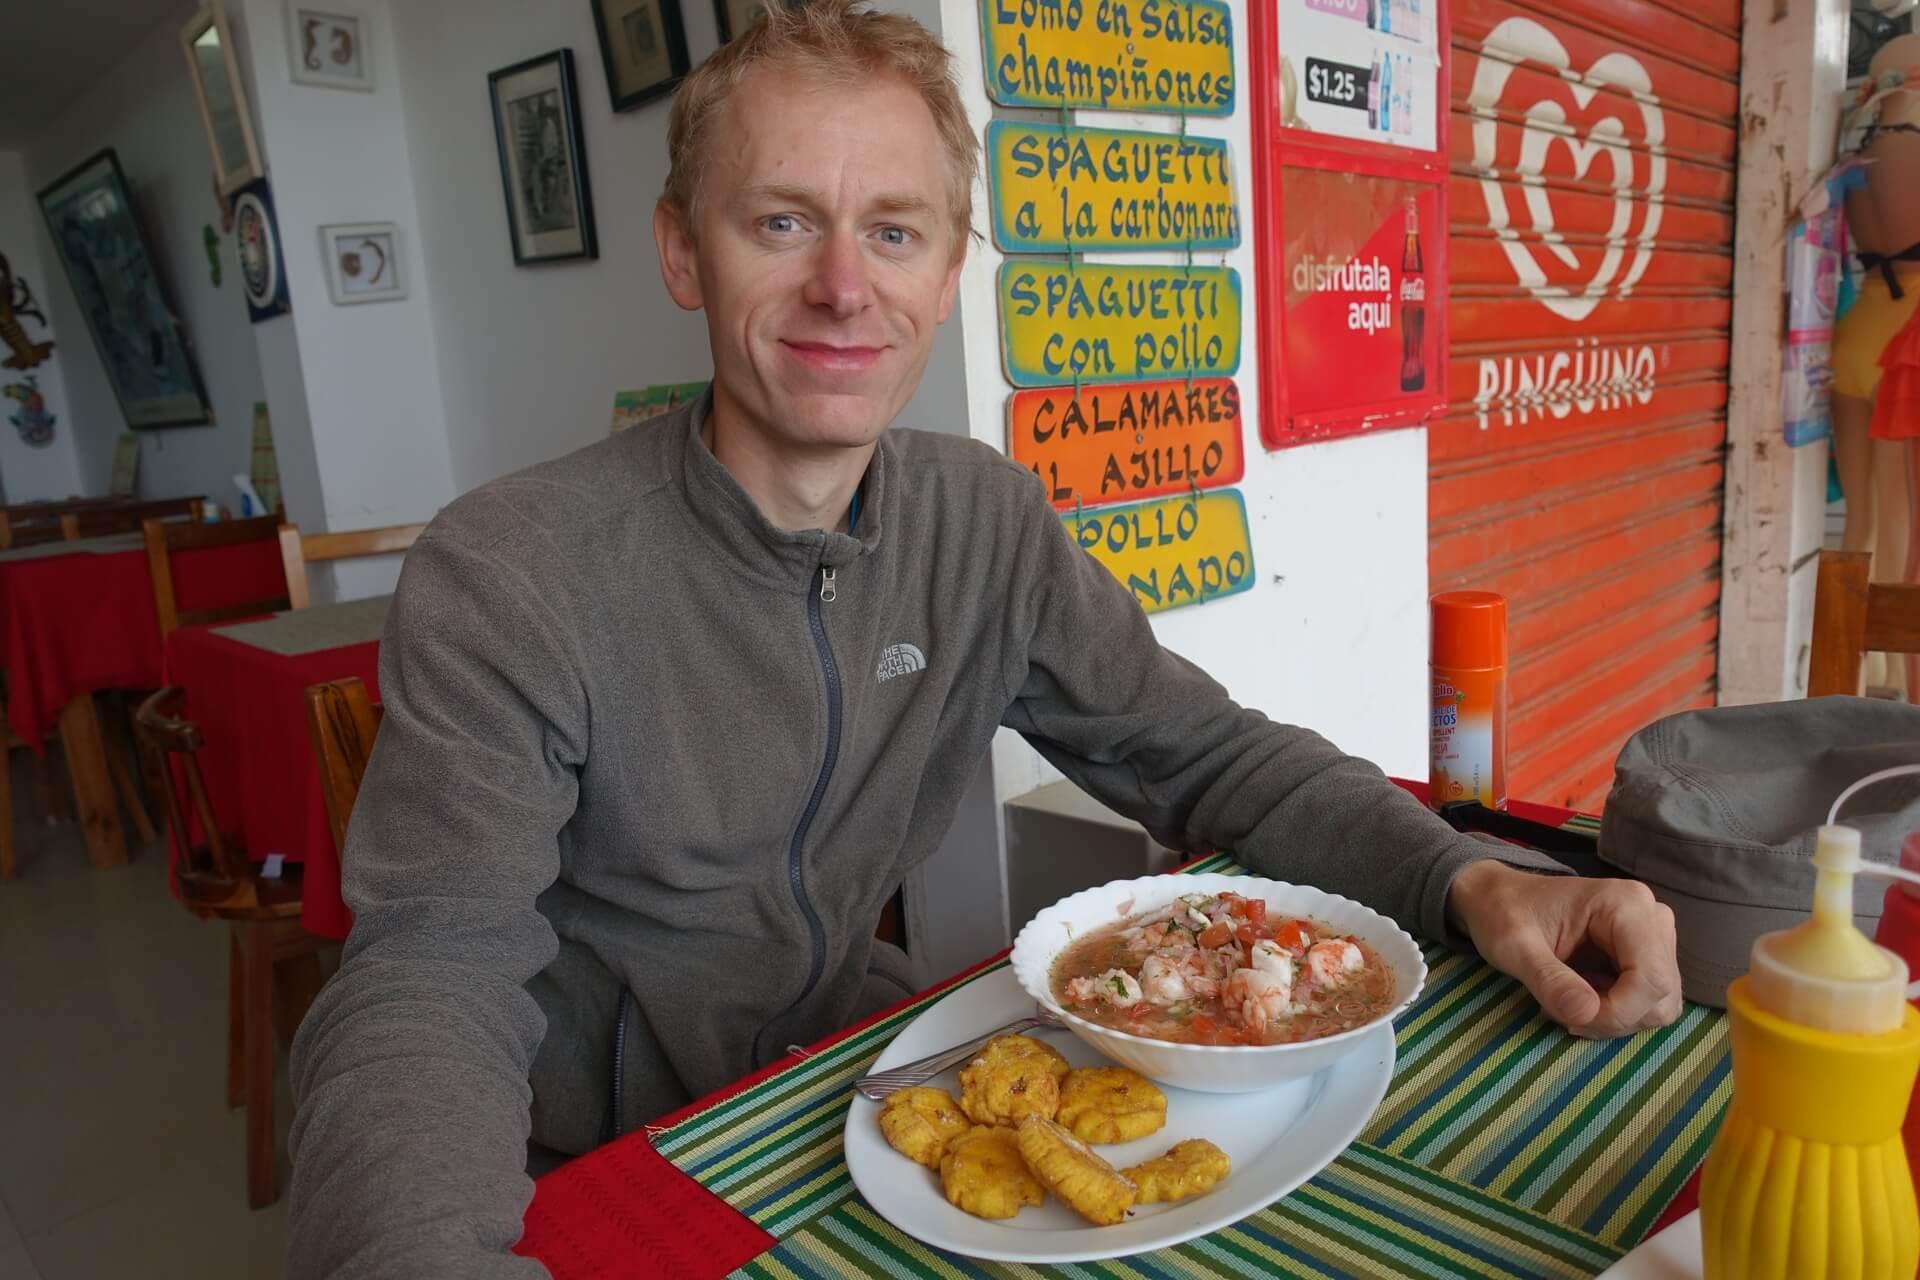 Michal i ekwadorskie ceviche